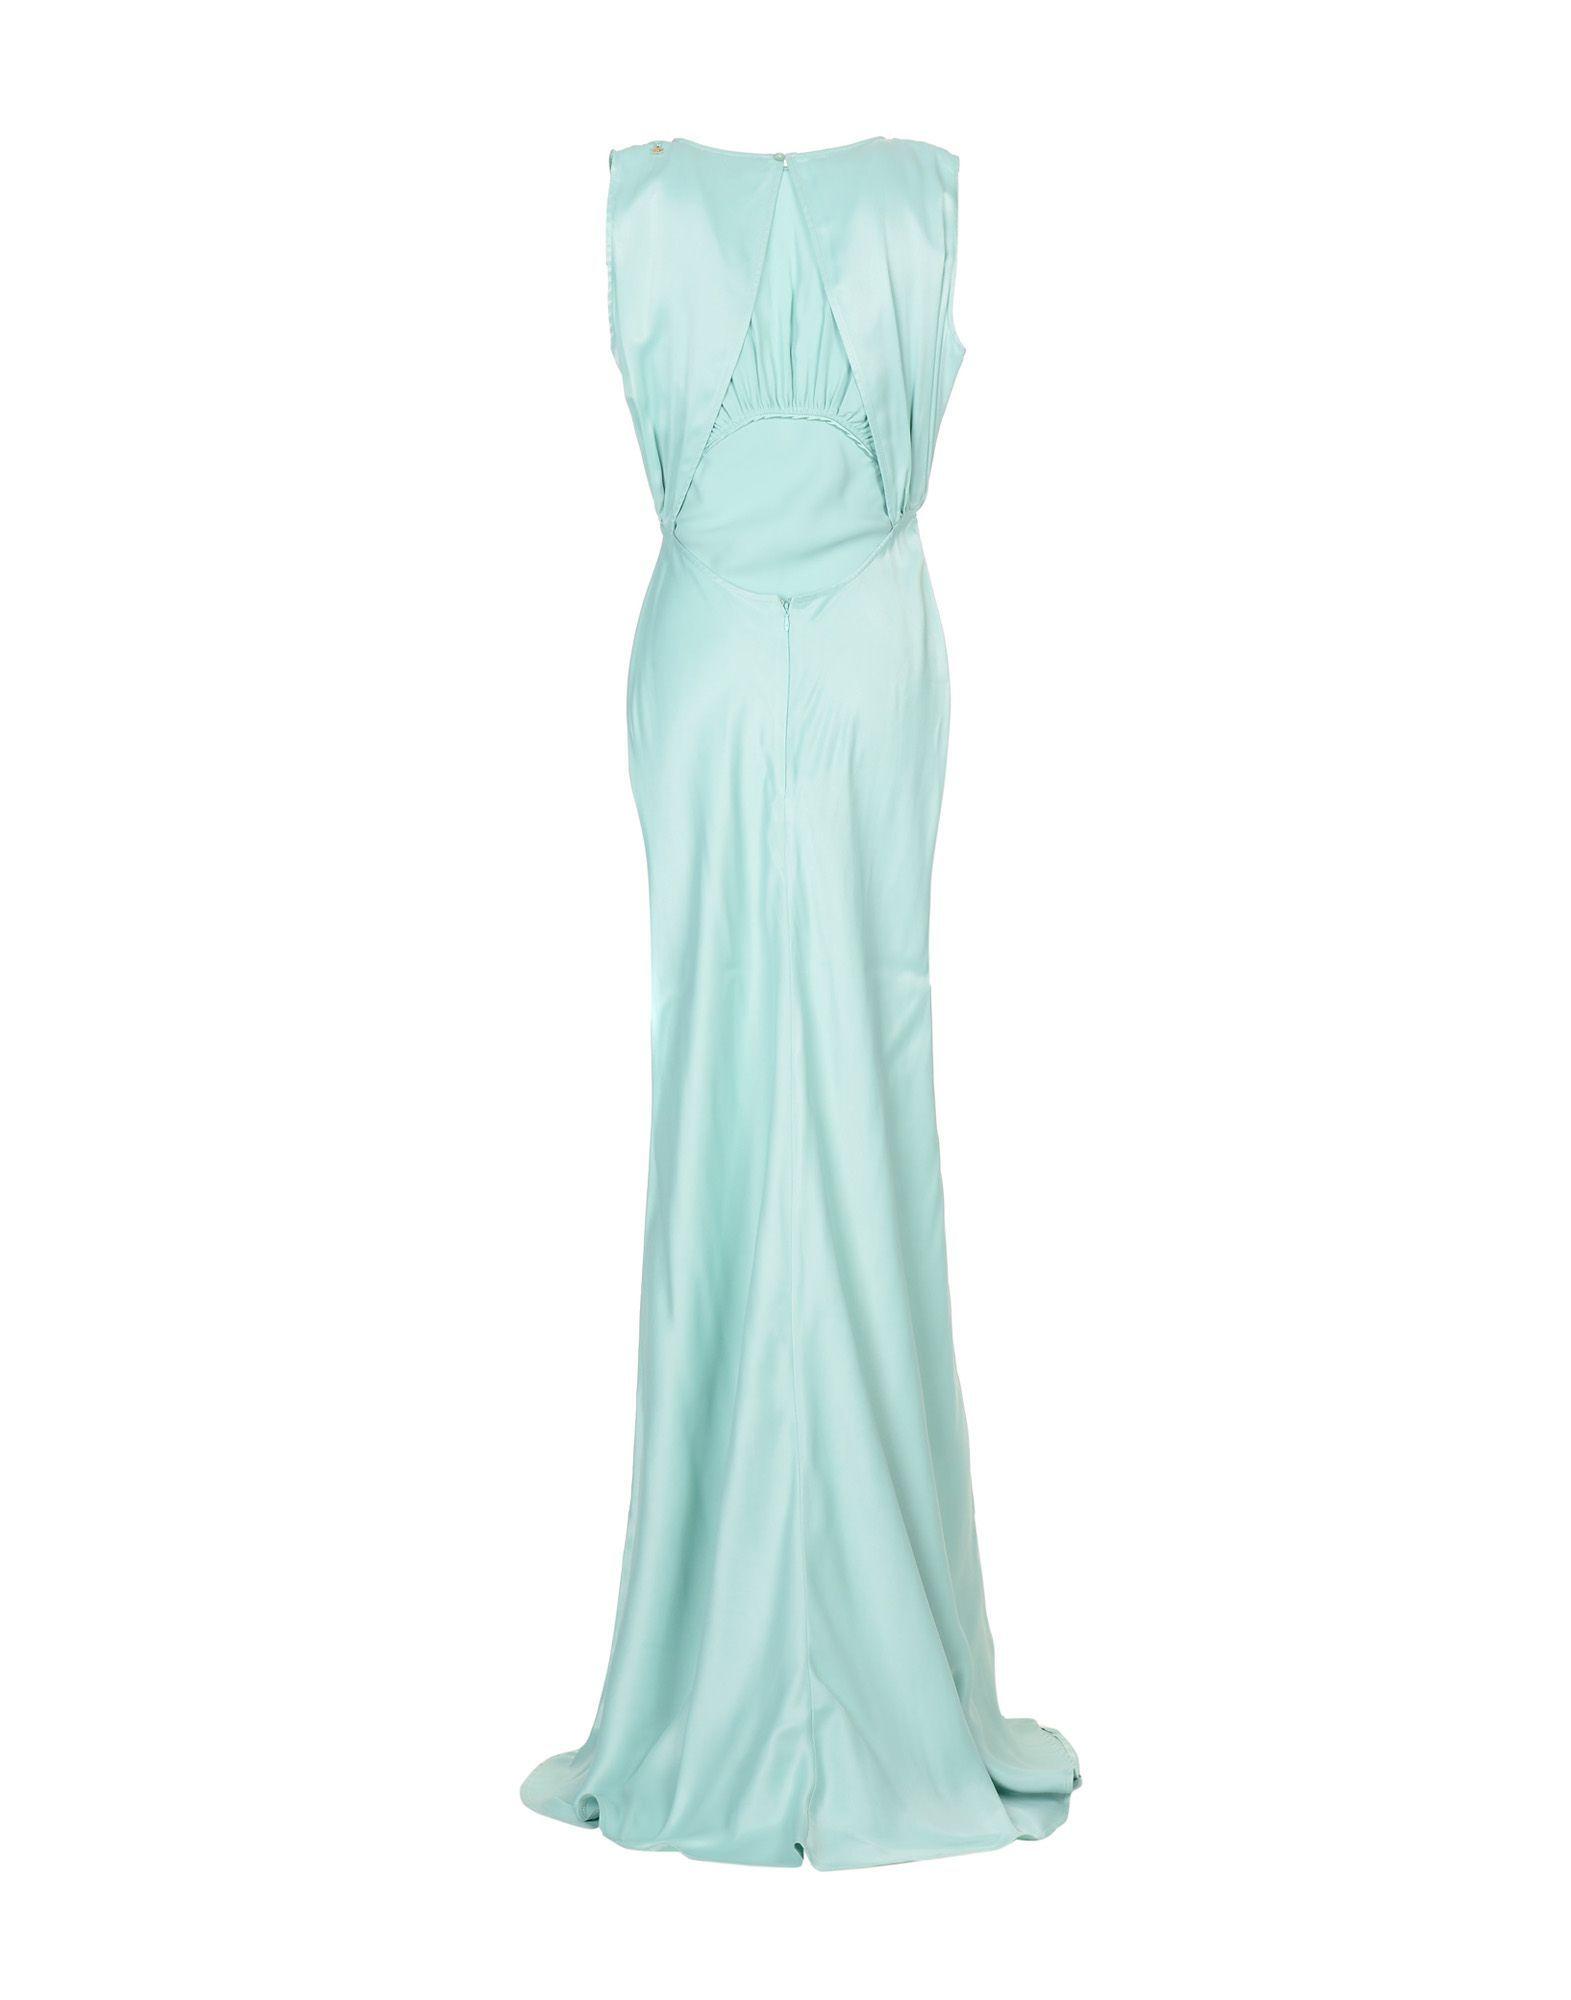 Elisabetta Franchi Light Green Full Length Dress